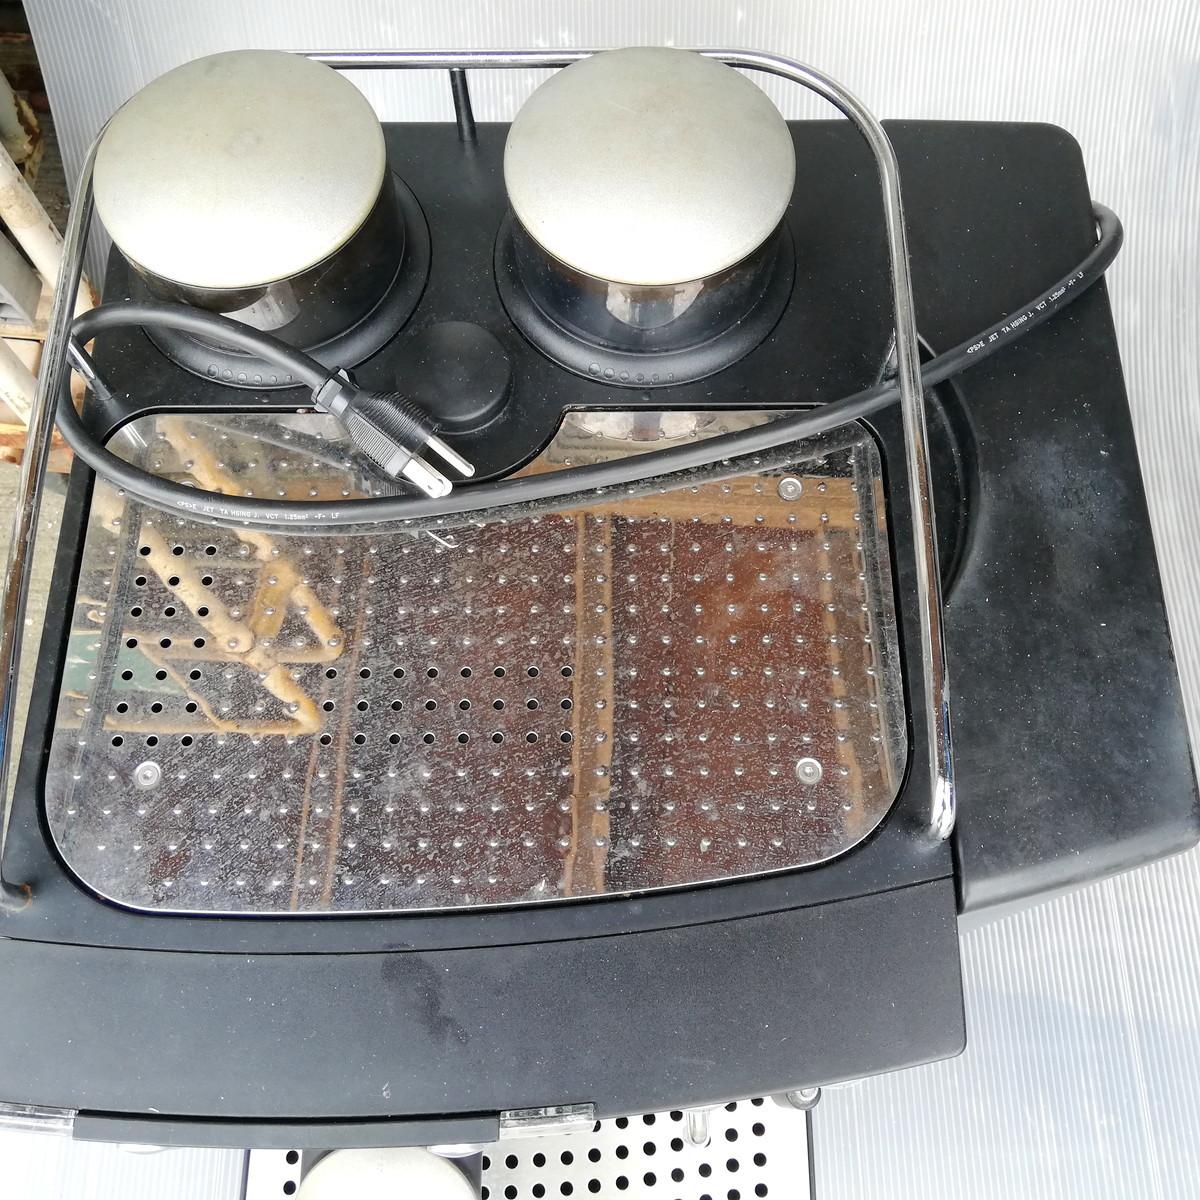 FR-1◆FRANKE フランケ Typ654 エスプレッソマシン 100V 通電確認済 コーヒーマシン / BONMAC BM-FAF1 ★引取歓迎(大阪)_画像6